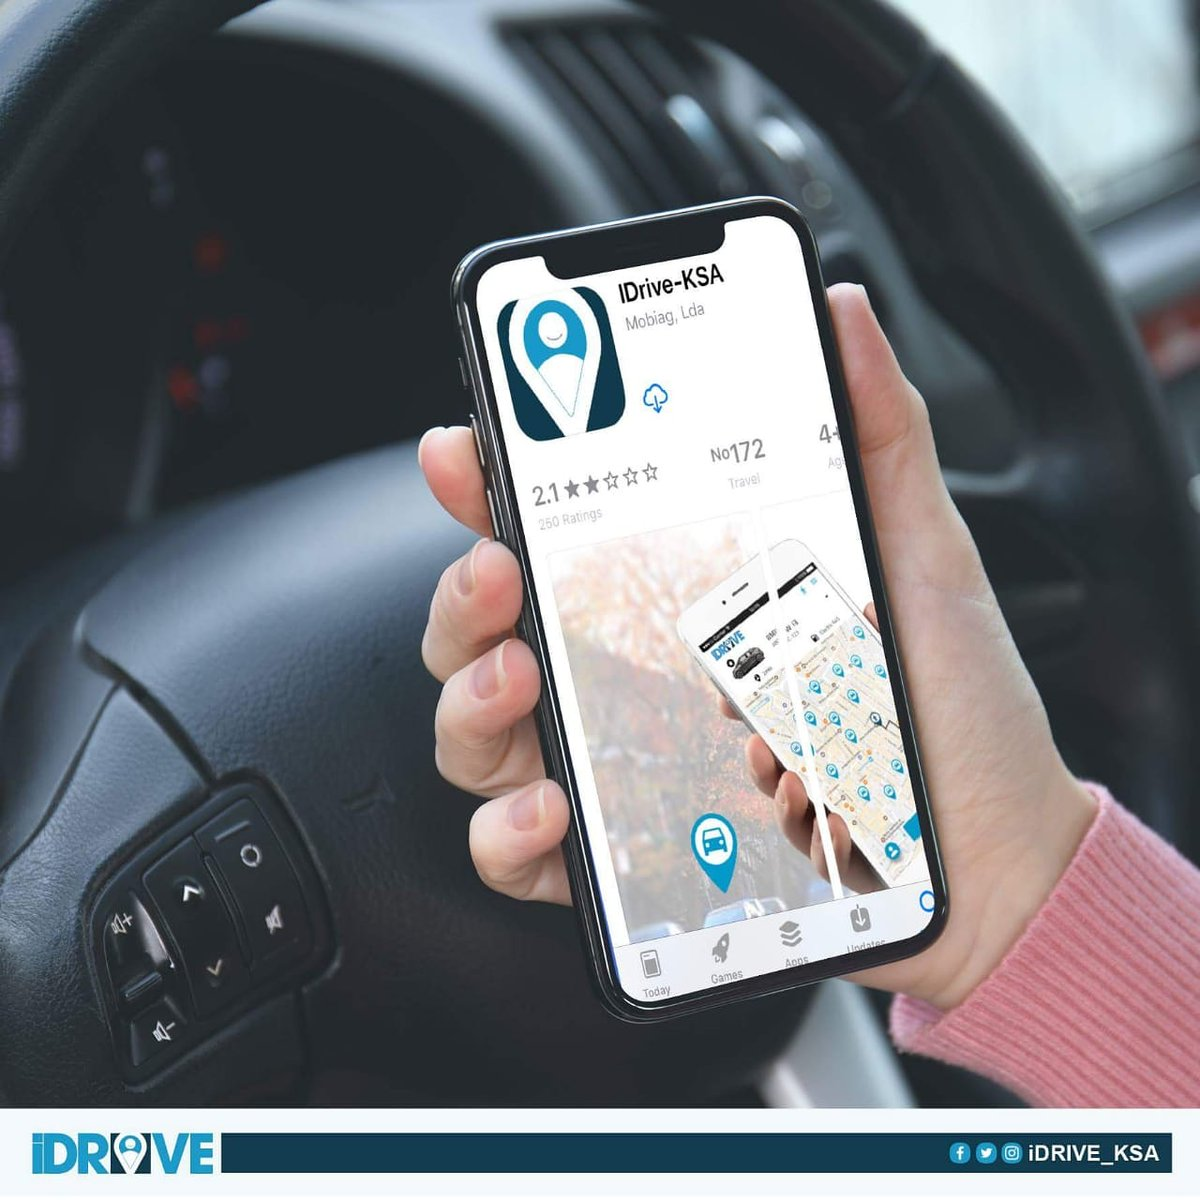 DoA HMhXsAA8OkE - تطبيق IDrive-KSA أول تطبيق خاص بمشاركة السيارات في المملكة العربية السعودية